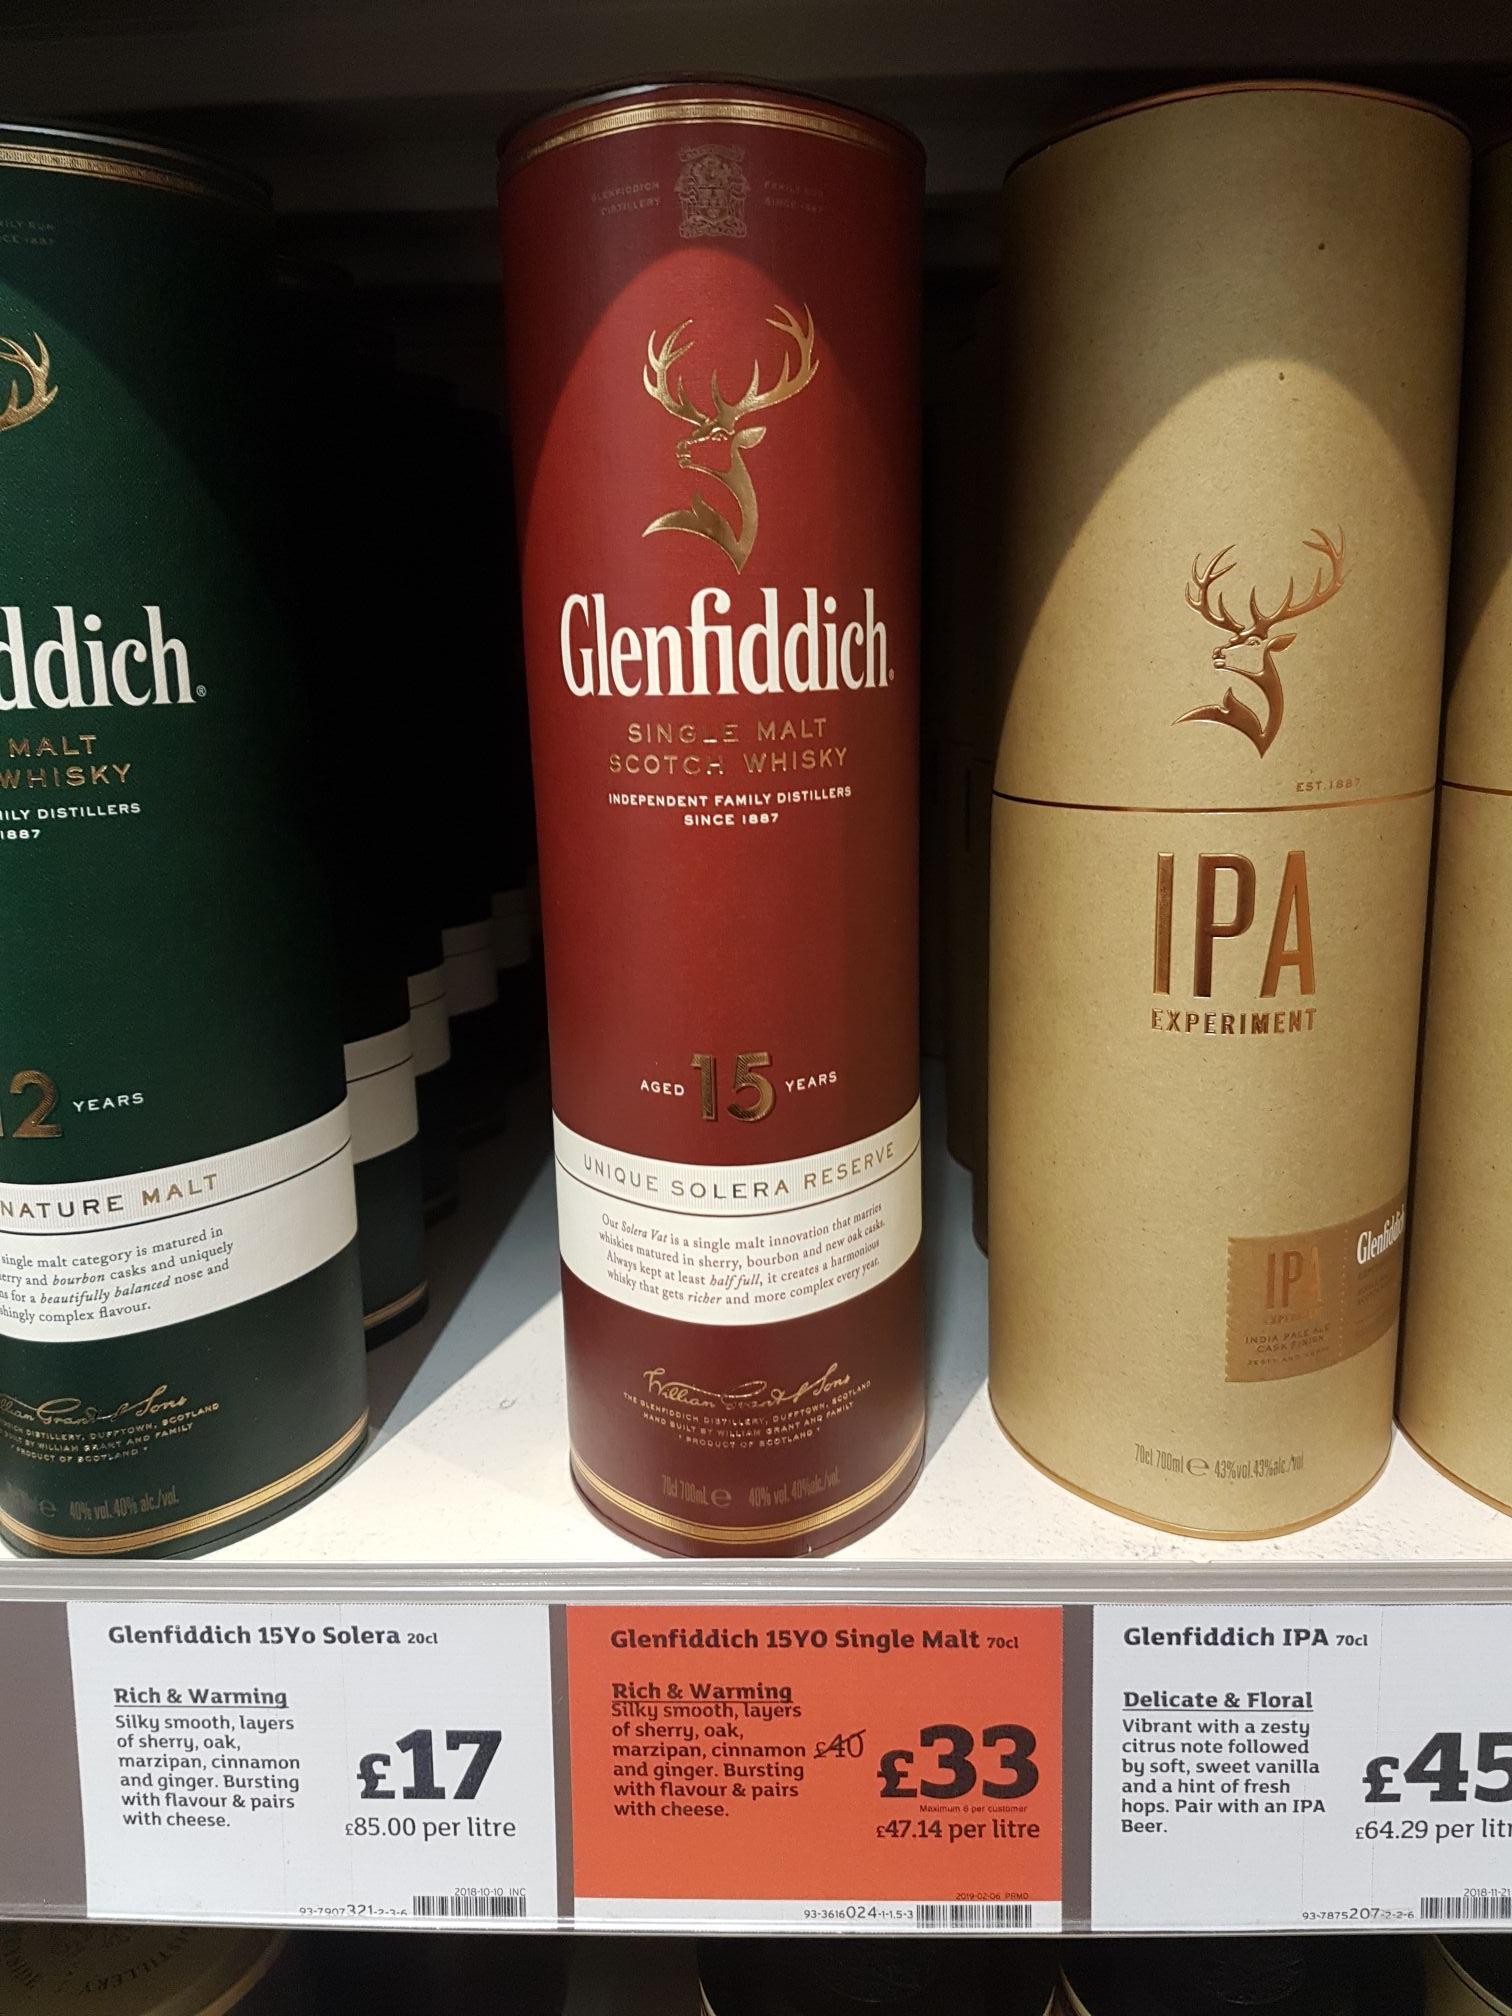 Glenfiddich Single Malt Whisky 15 Years Old £33 Sainsbury's